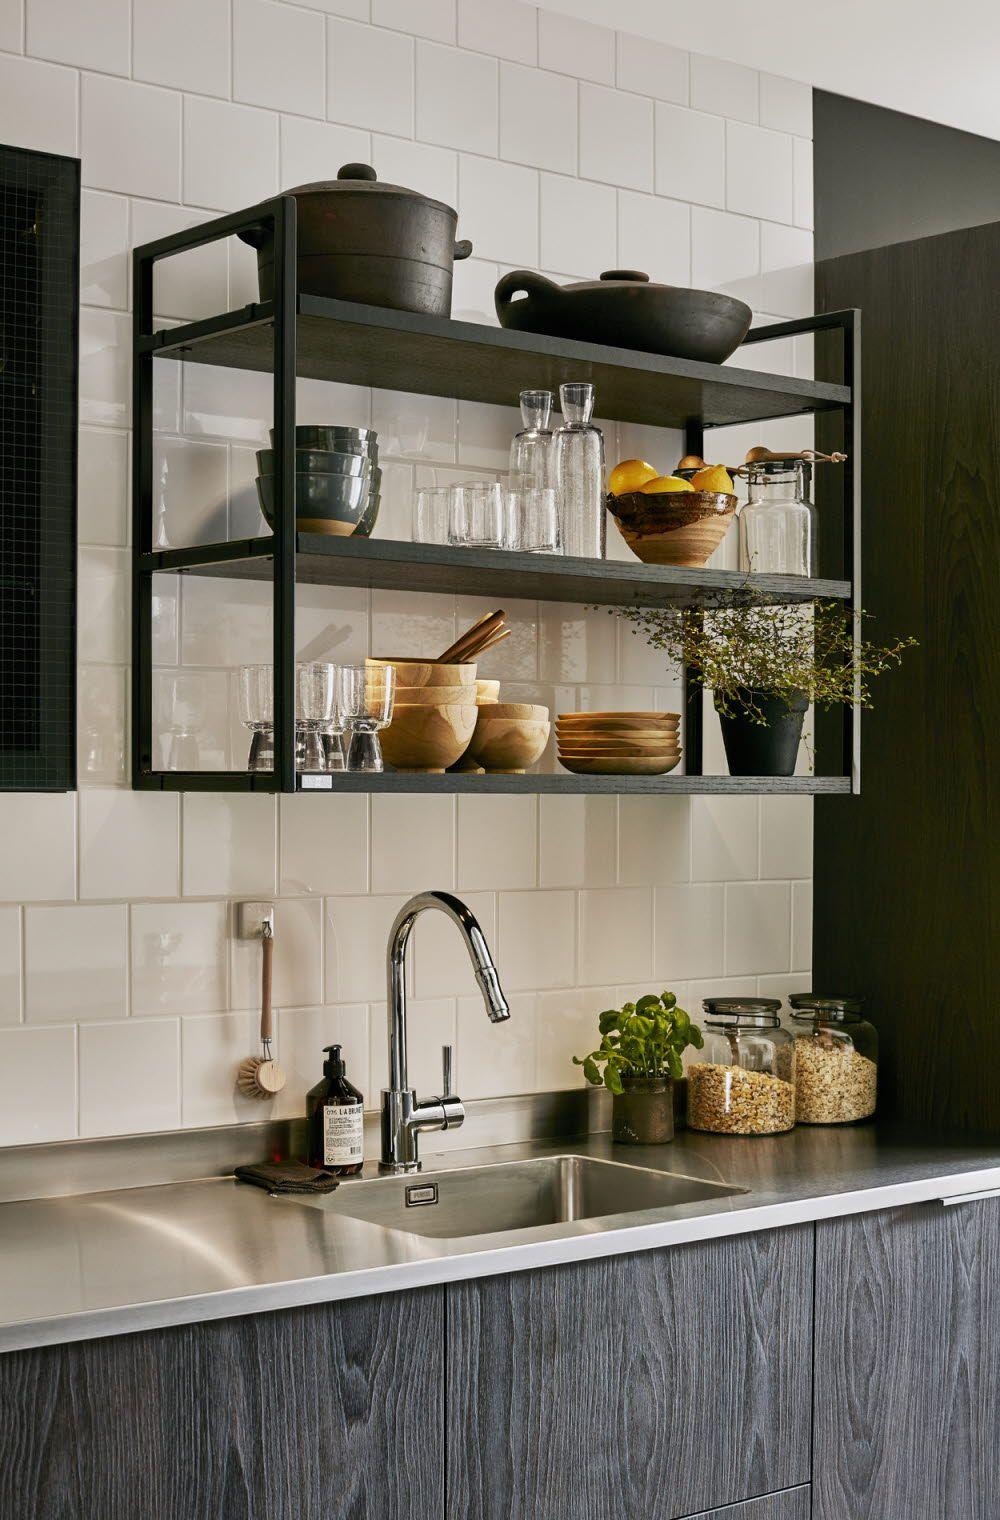 A la Carte -keittiöt Bistro -Hyllykkö #keittiö #kitchen #bistro